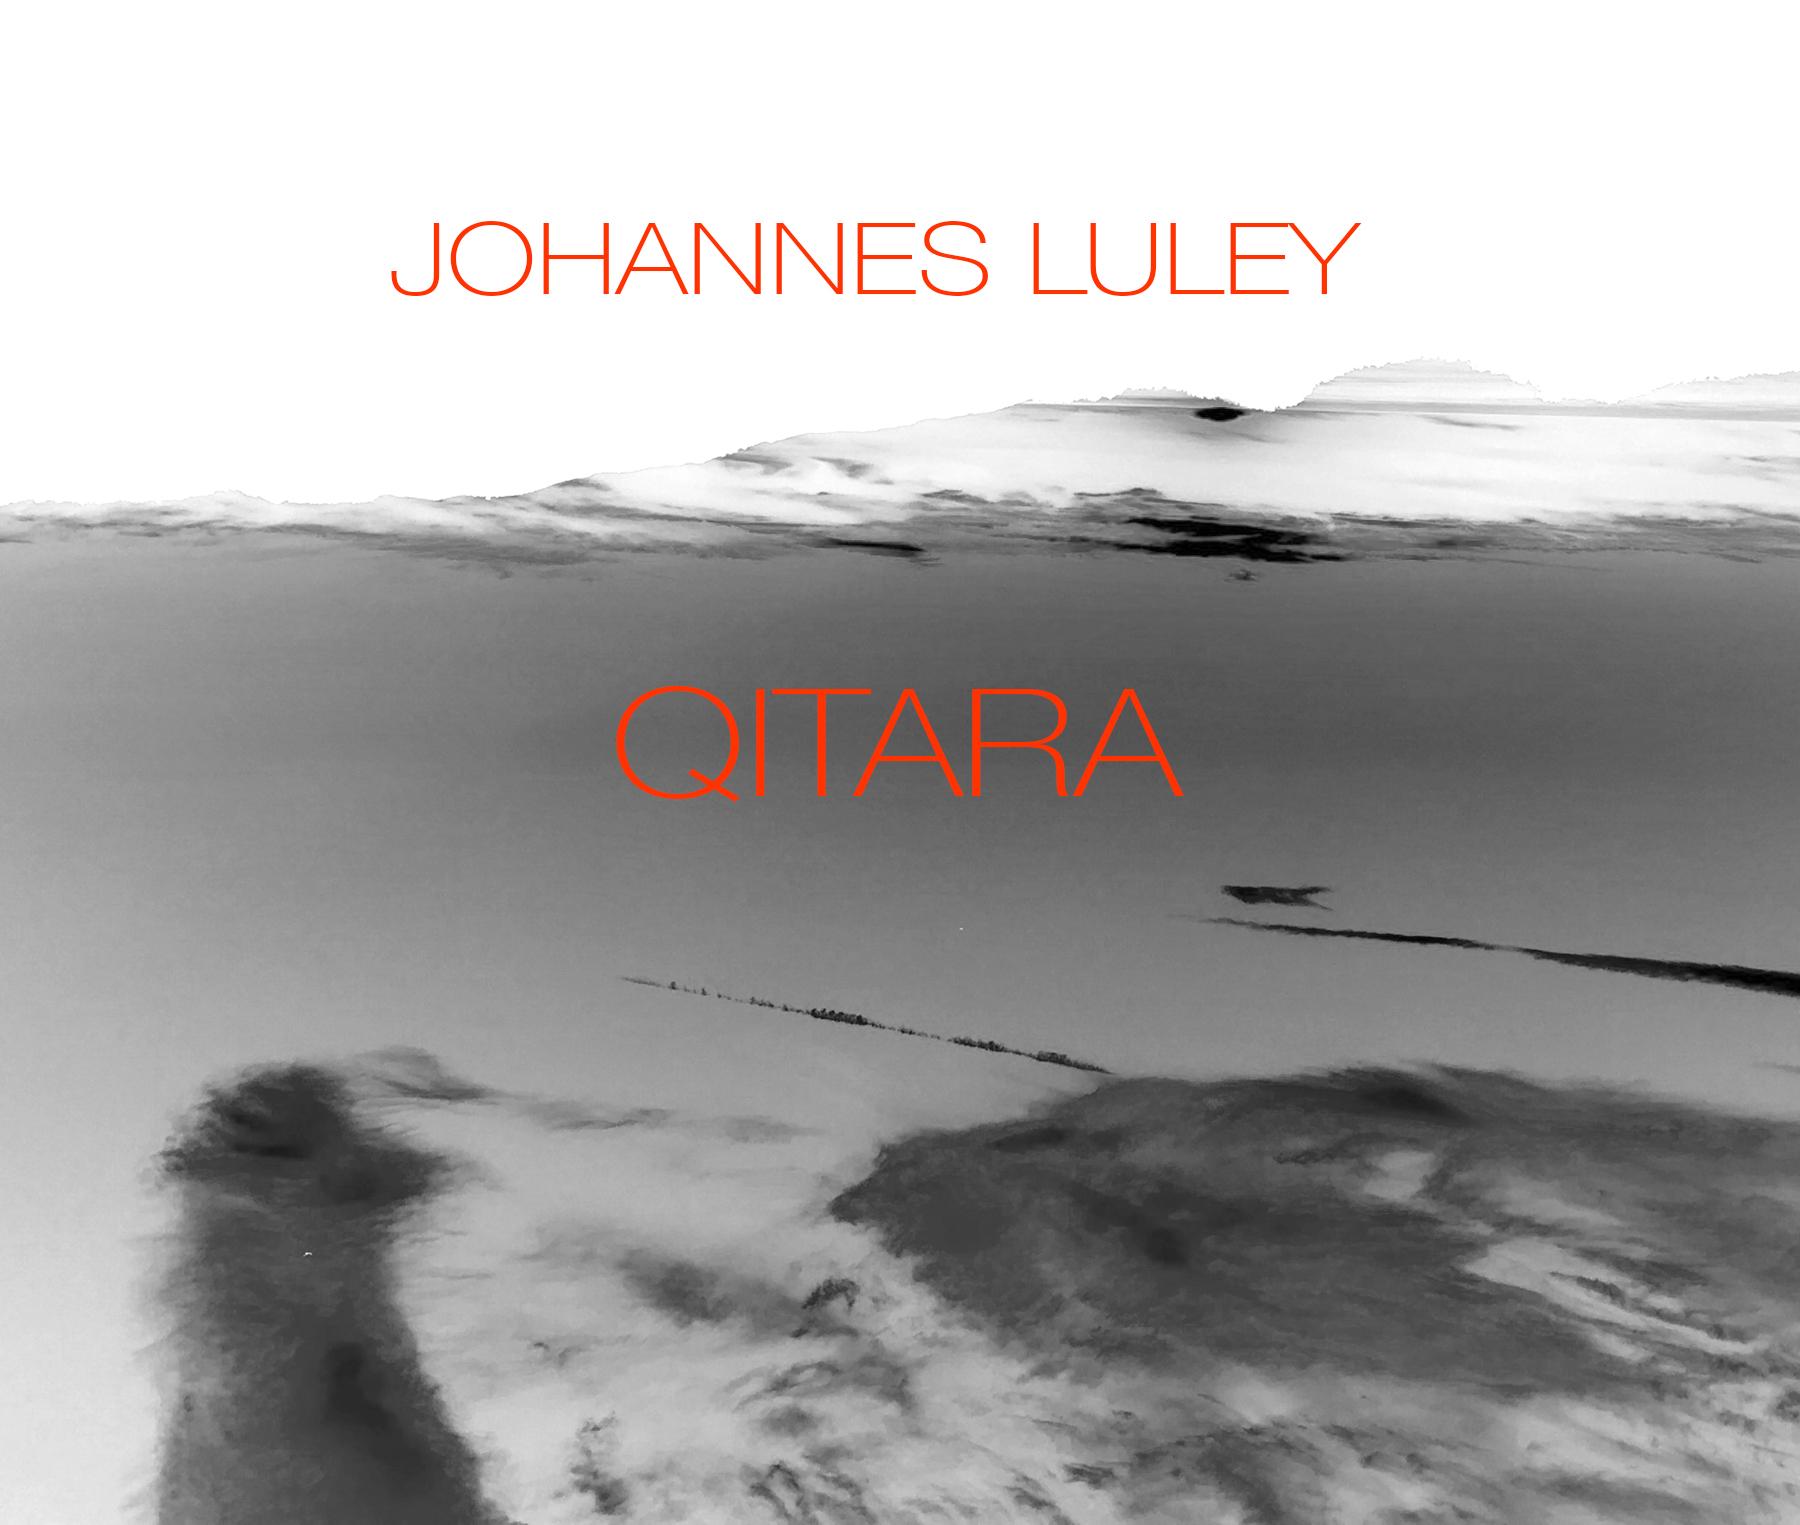 Qitara Cover art